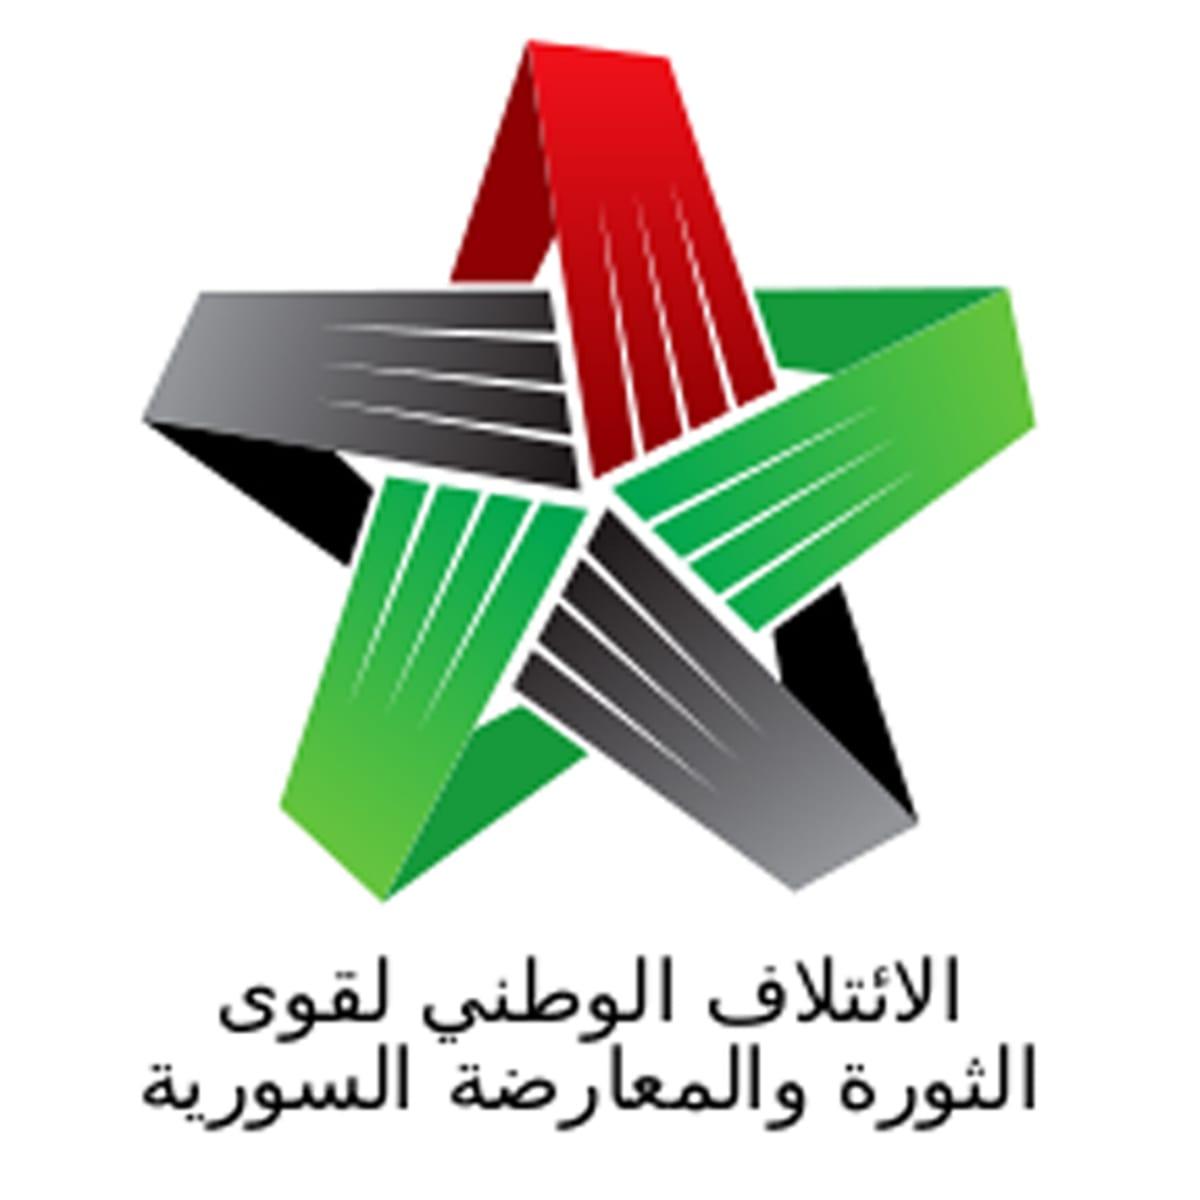 Merkki logo